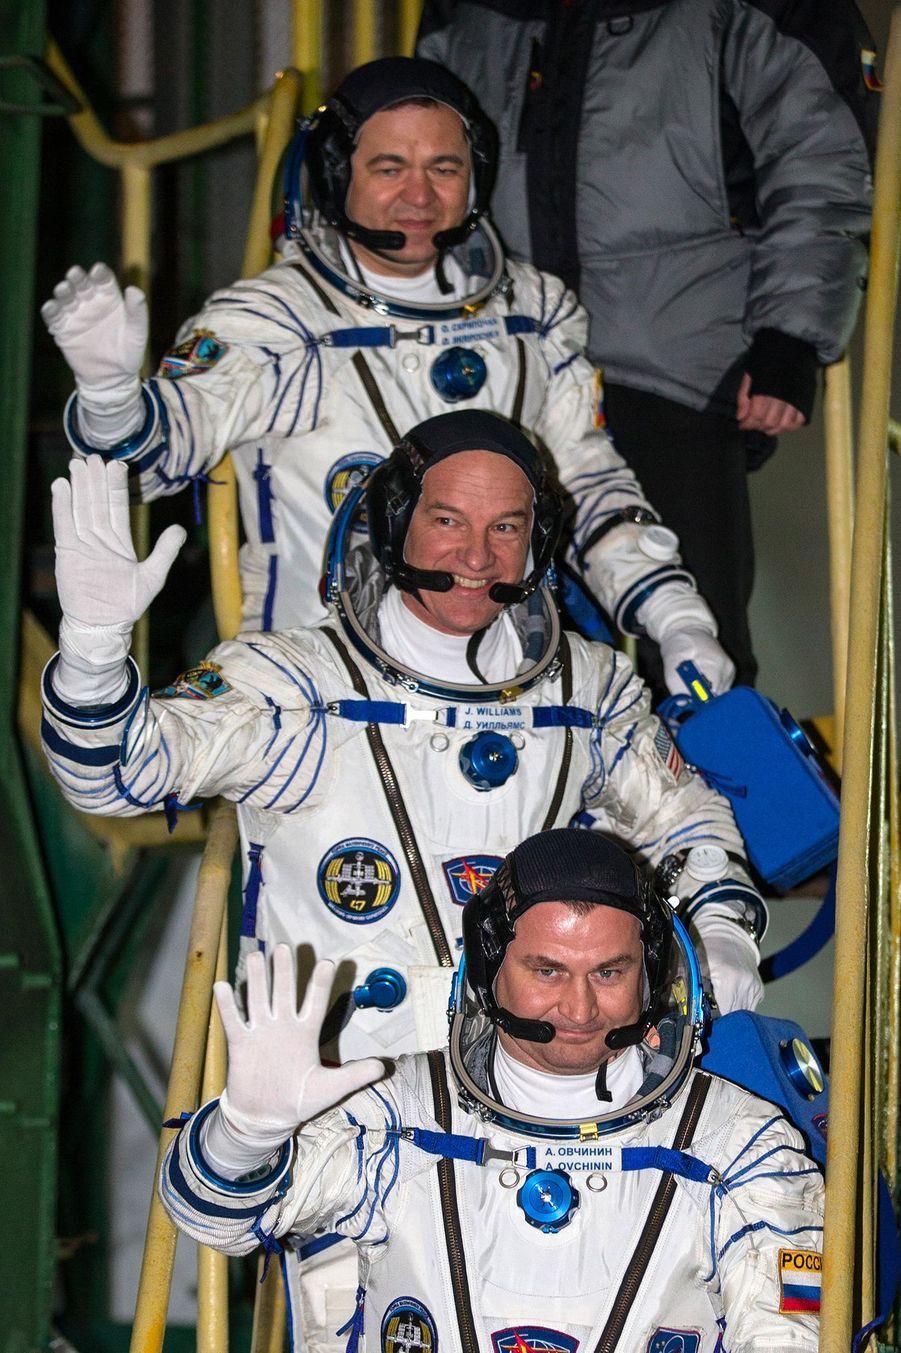 Jeff Williams, Oleg Skripotchka et Alexeï Ovtchinine